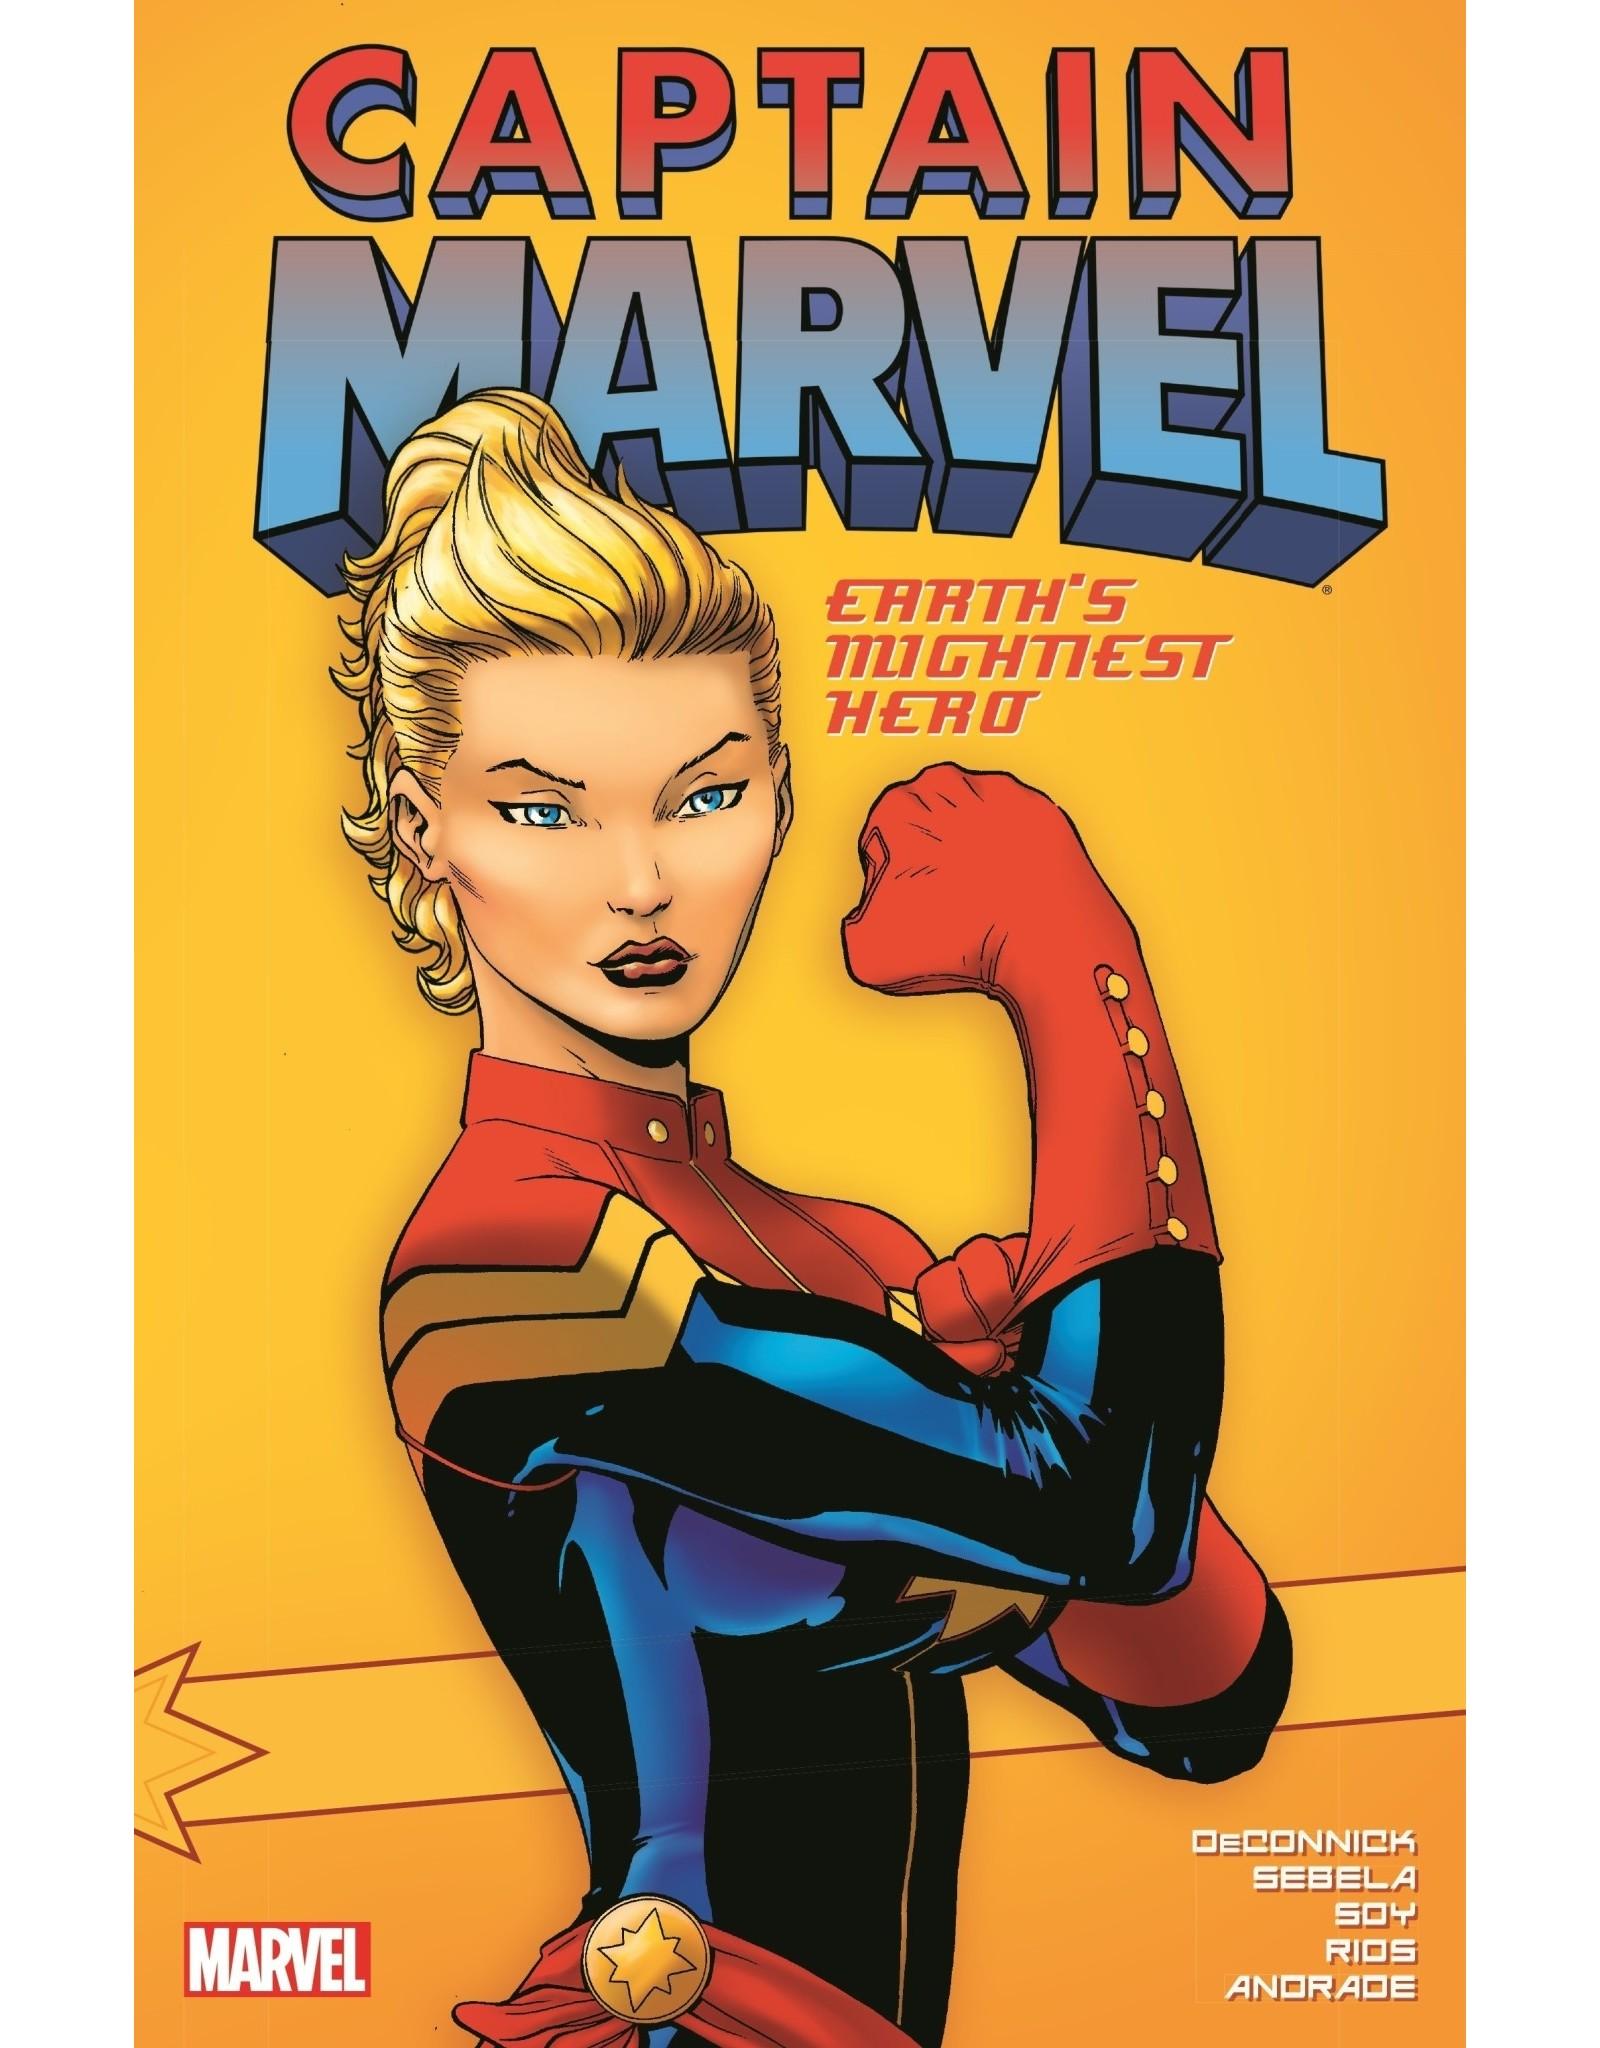 MARVEL COMICS CAPTAIN MARVEL EARTHS MIGHTIEST HERO TP VOL 01